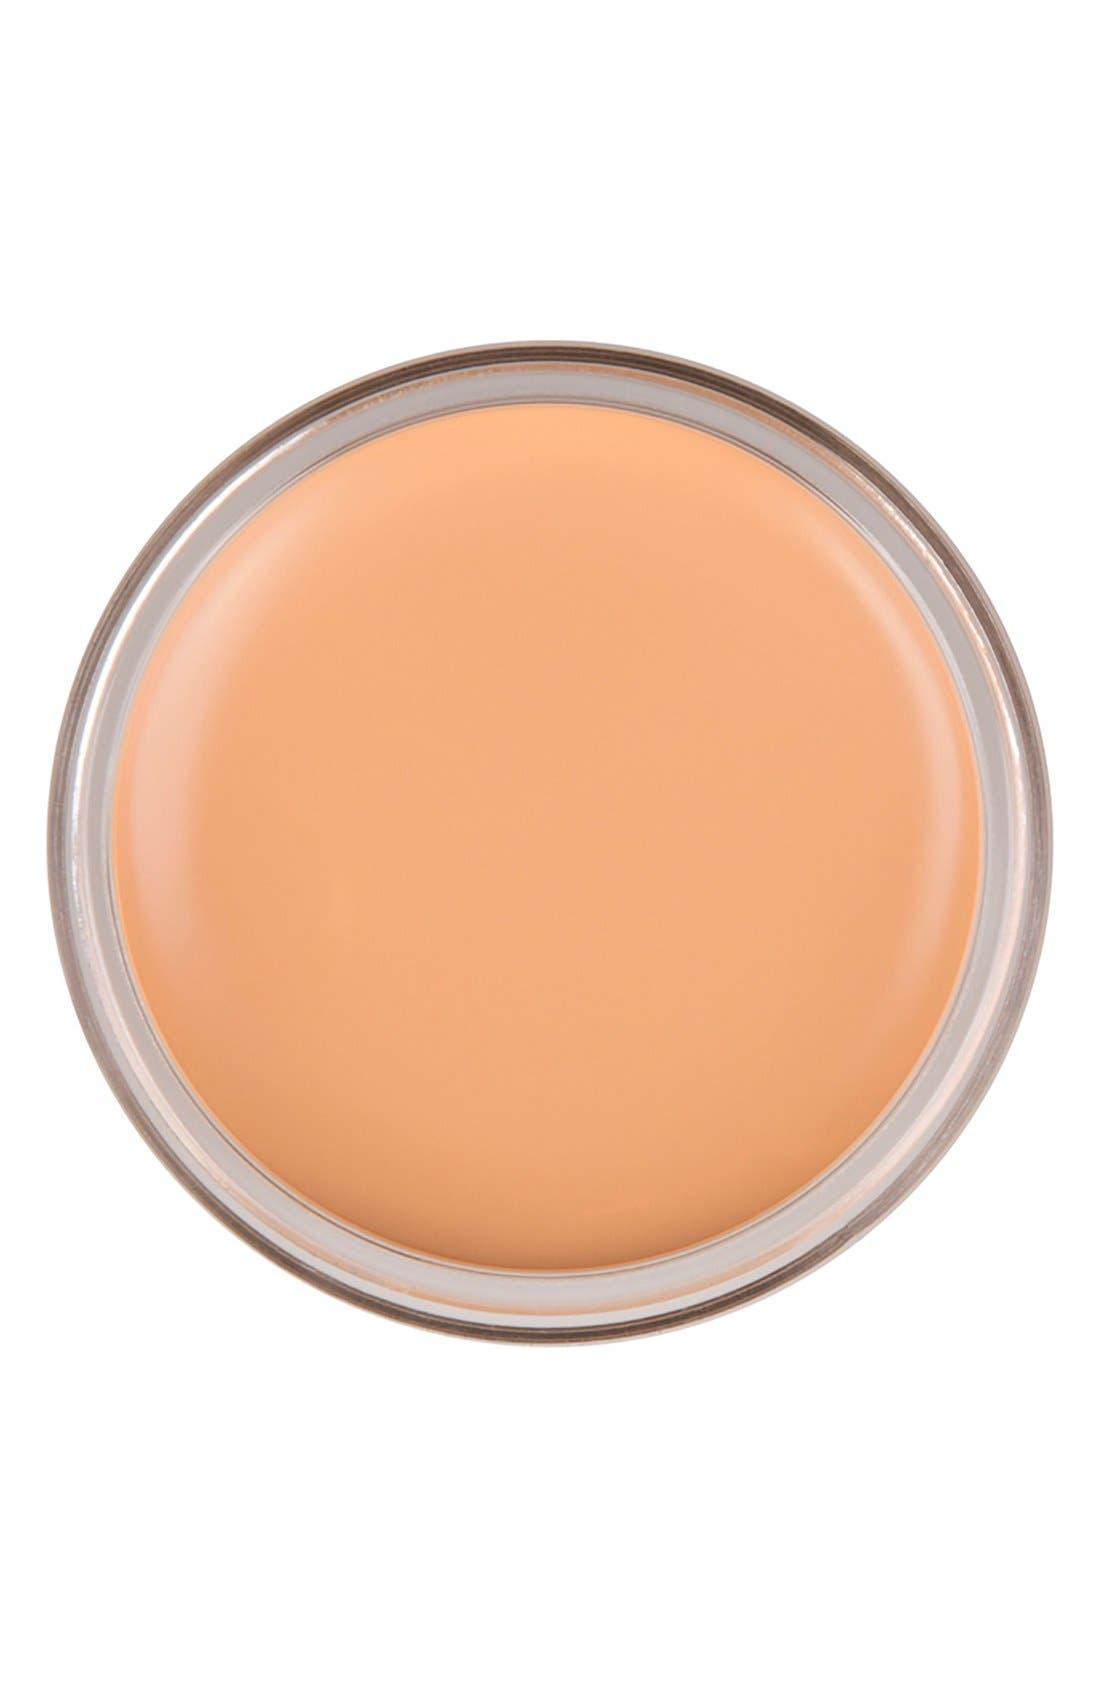 Sigma Beauty Lip Concealer